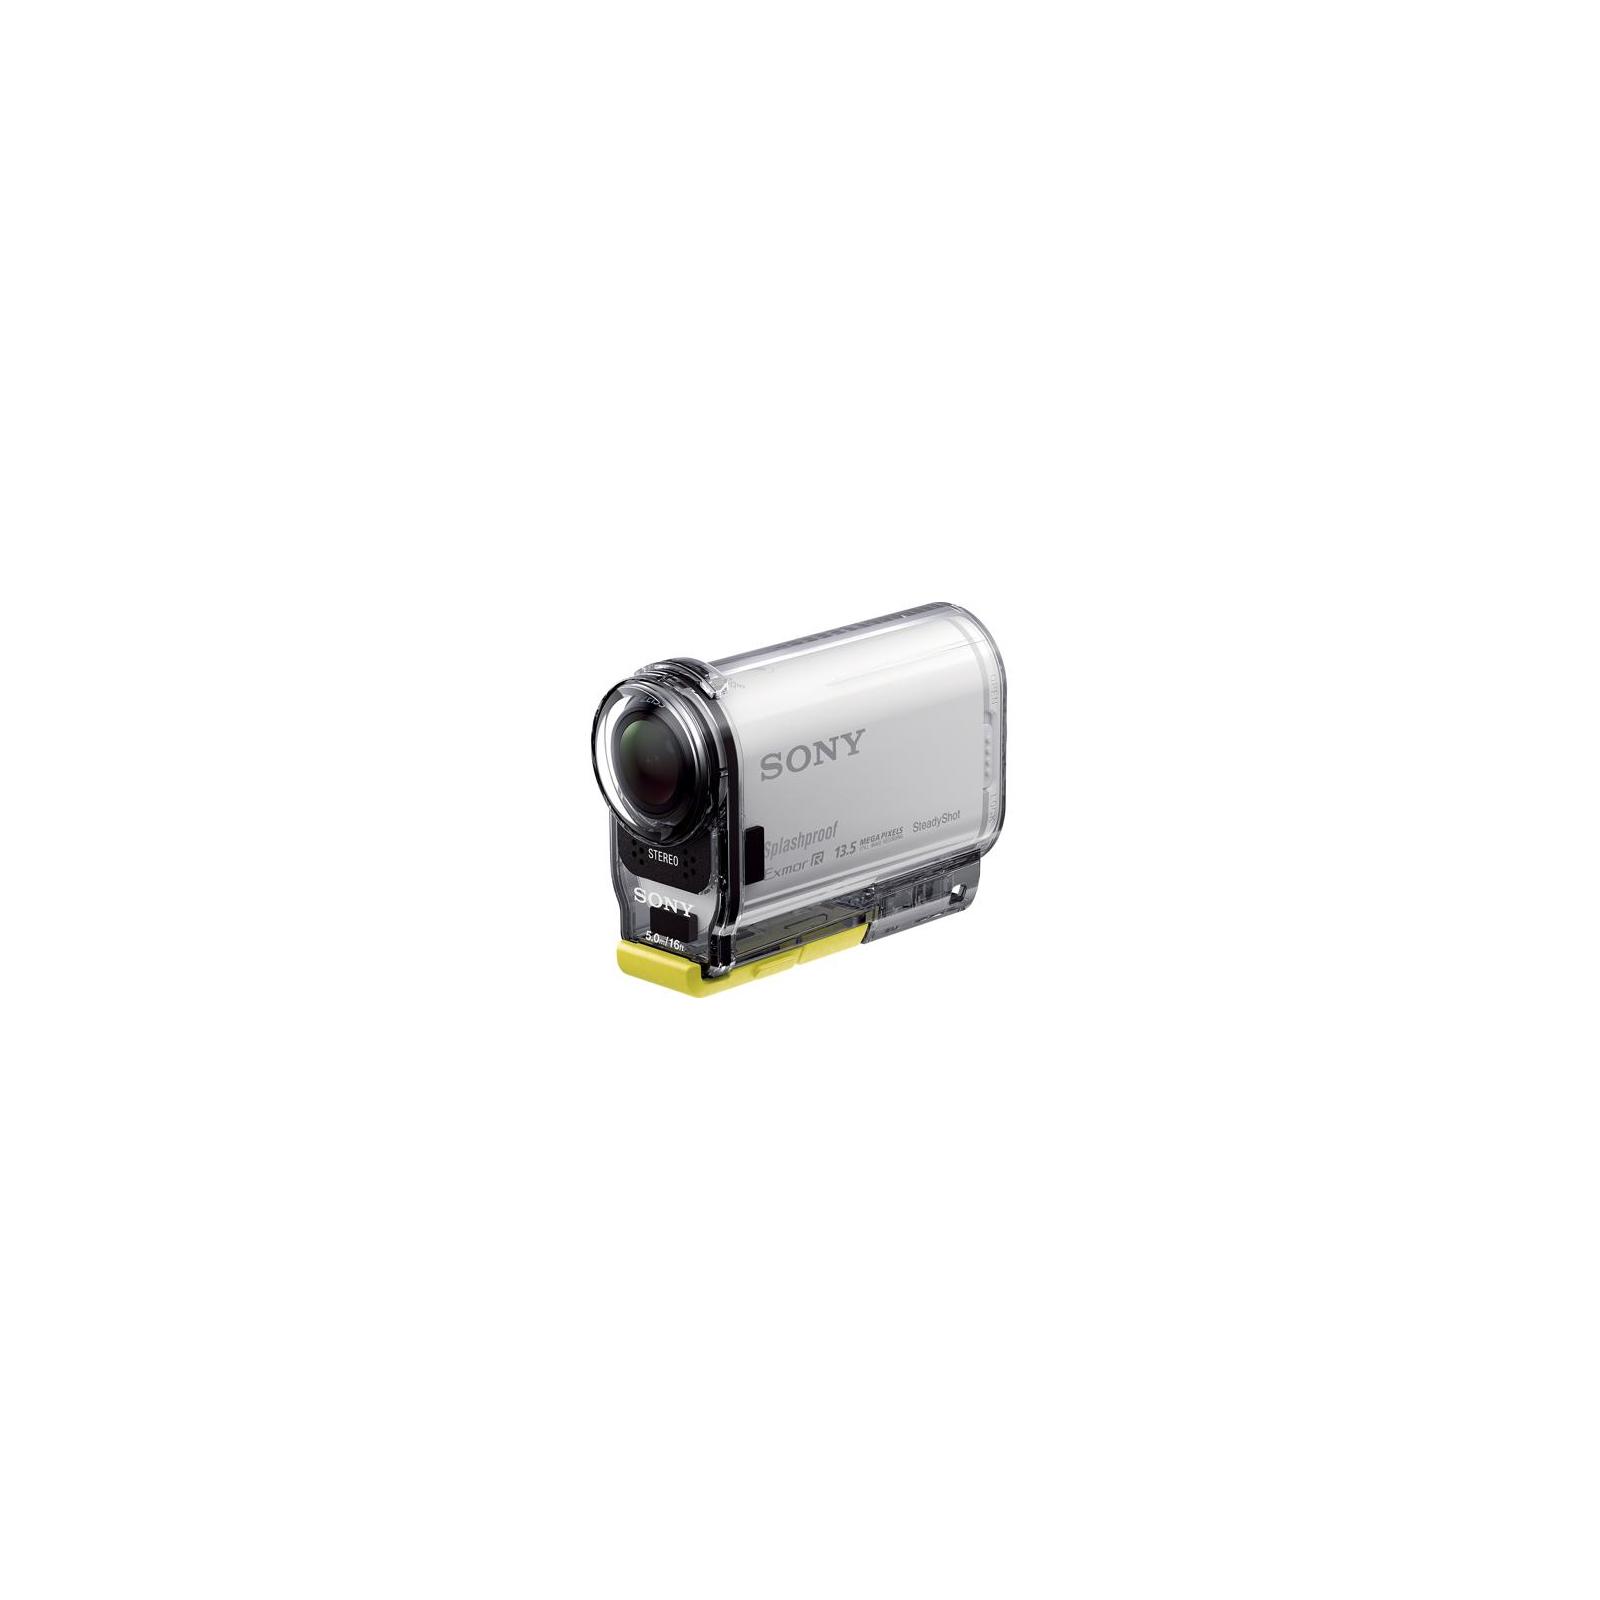 Экшн-камера SONY HDR-AS100V w/mount kit (HDRAS100VW.CEN) изображение 3